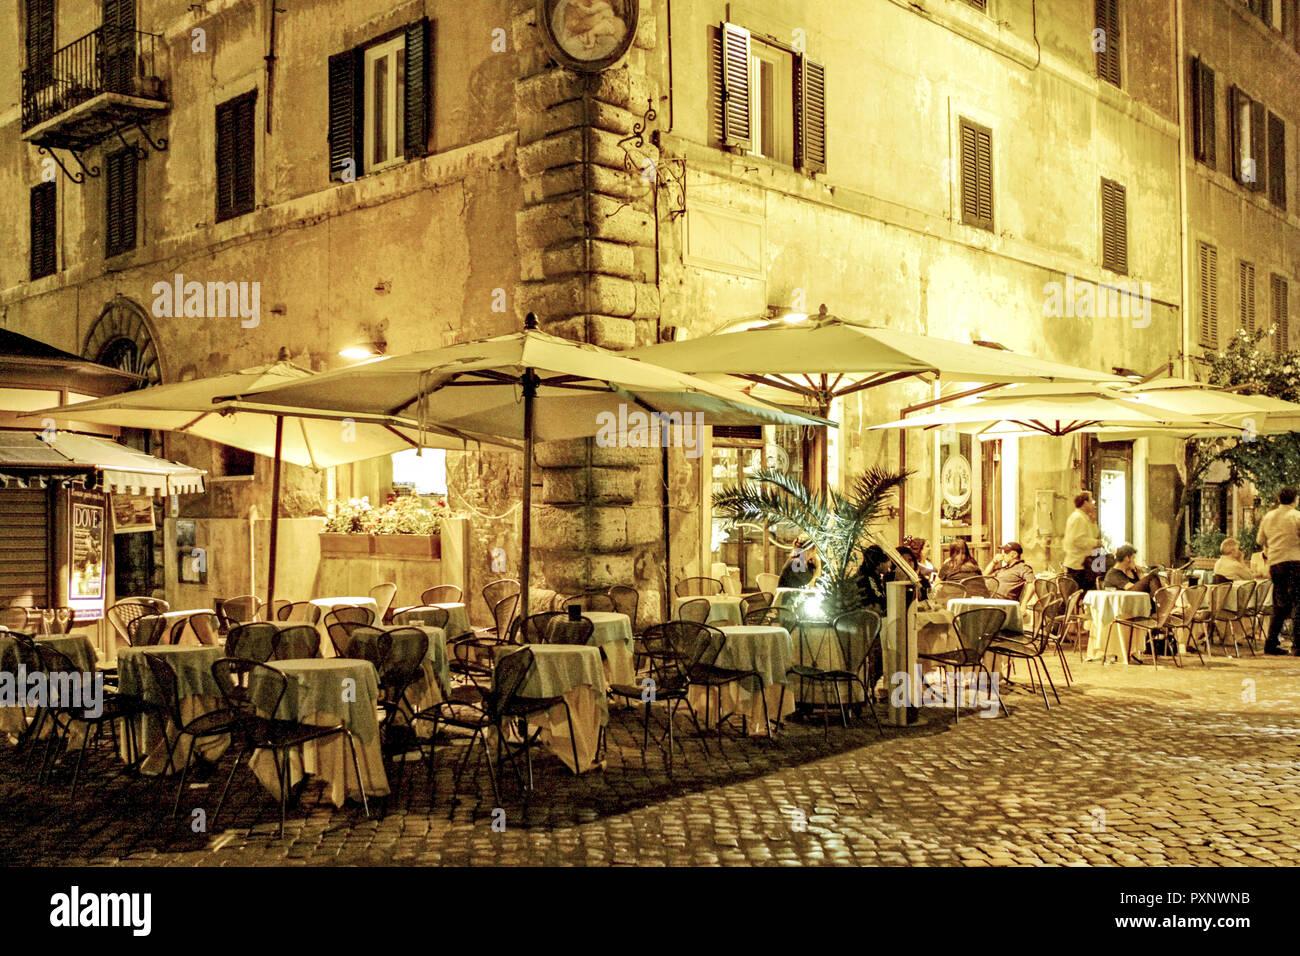 Italy, Rom, Restaurant am Piazza Farnese bei Nacht - Stock Image